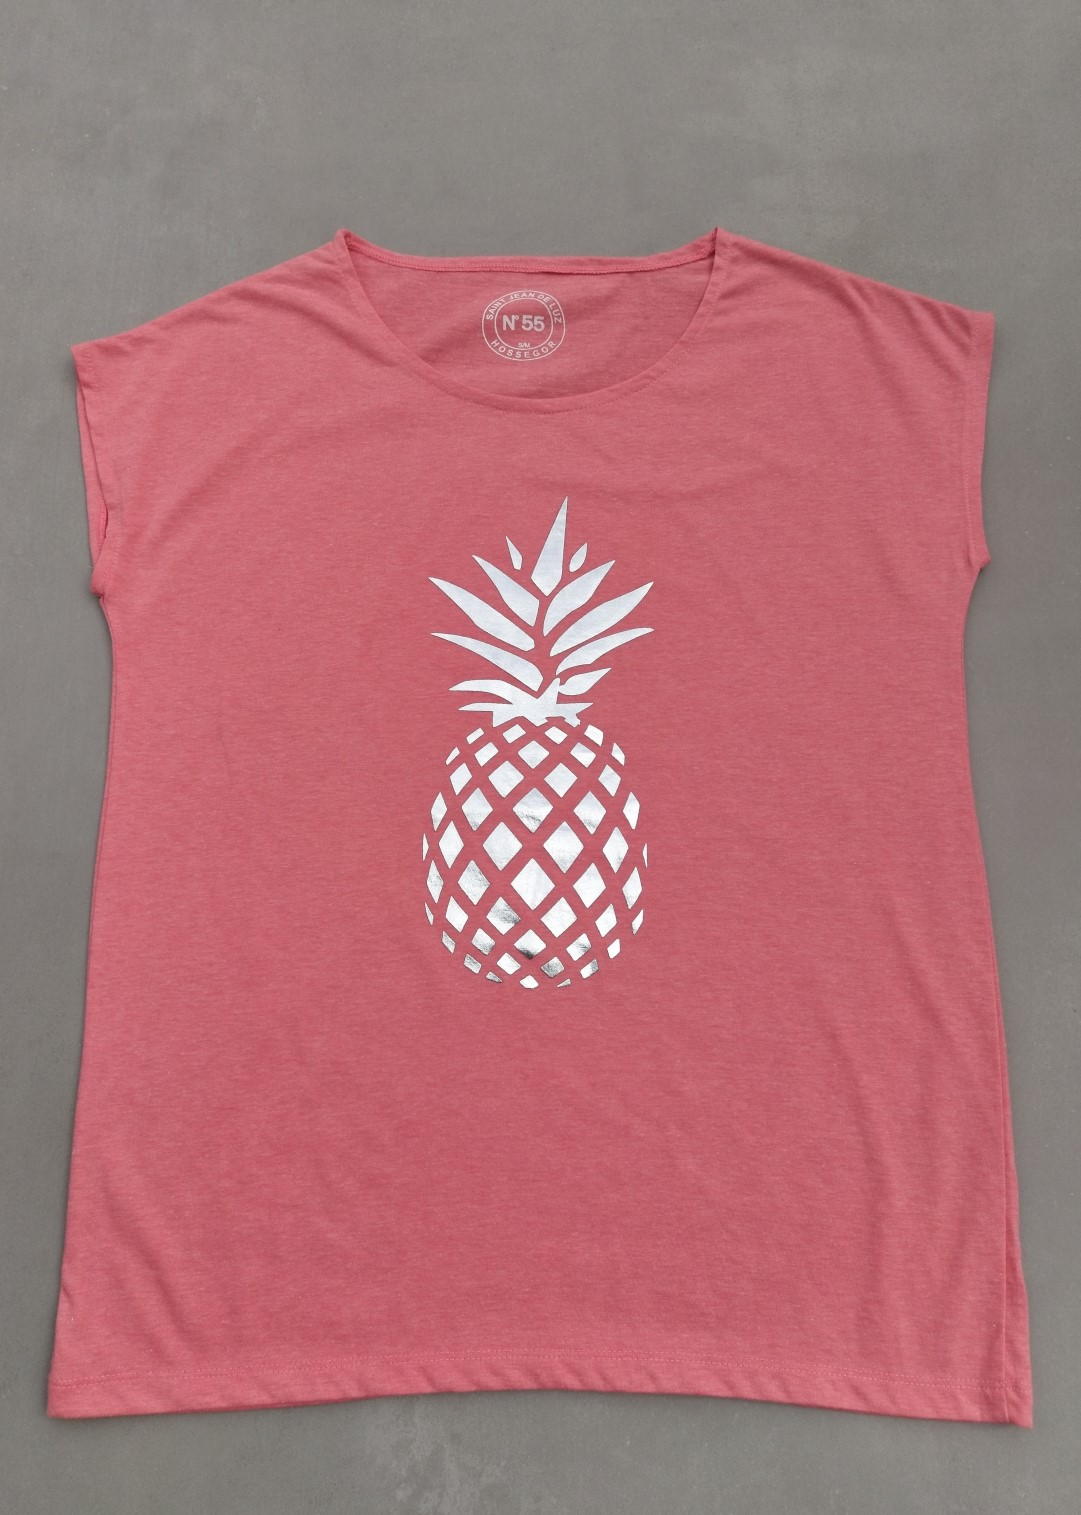 Tee shirt corail N°55 Ananas argent.